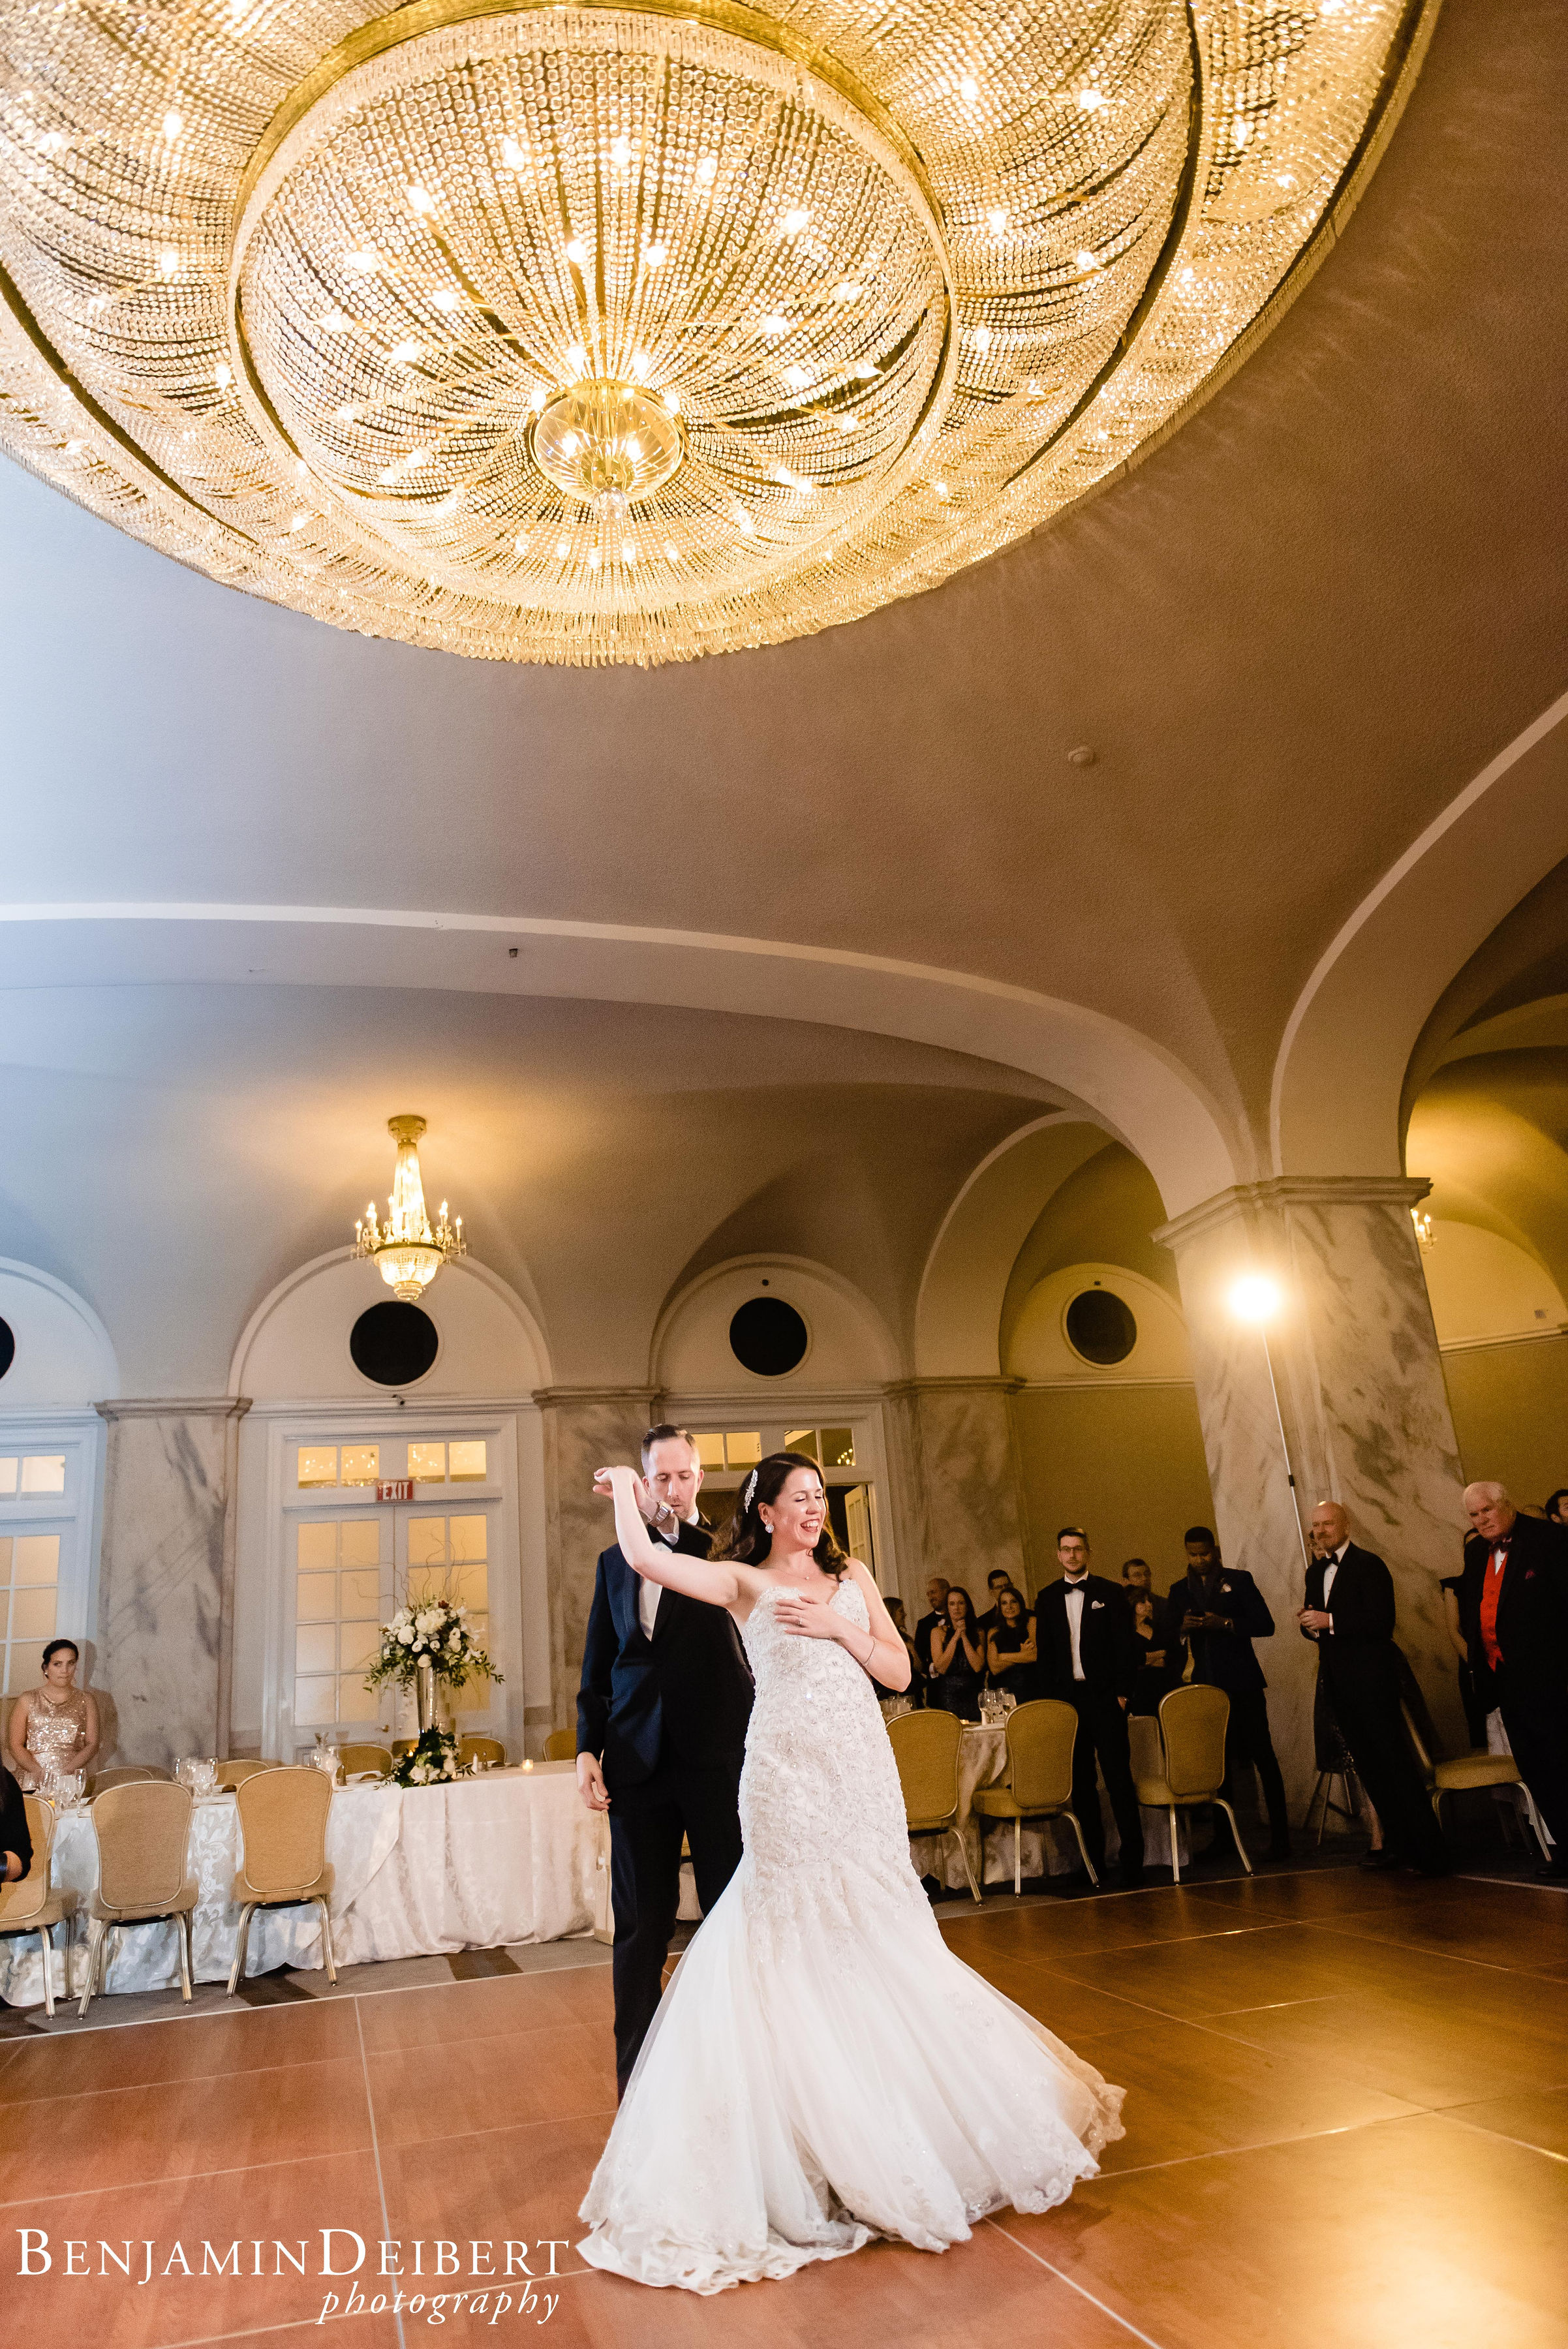 AlexandraandNicholas_RitzCarltonPhiladelphia_Wedding-56.jpg